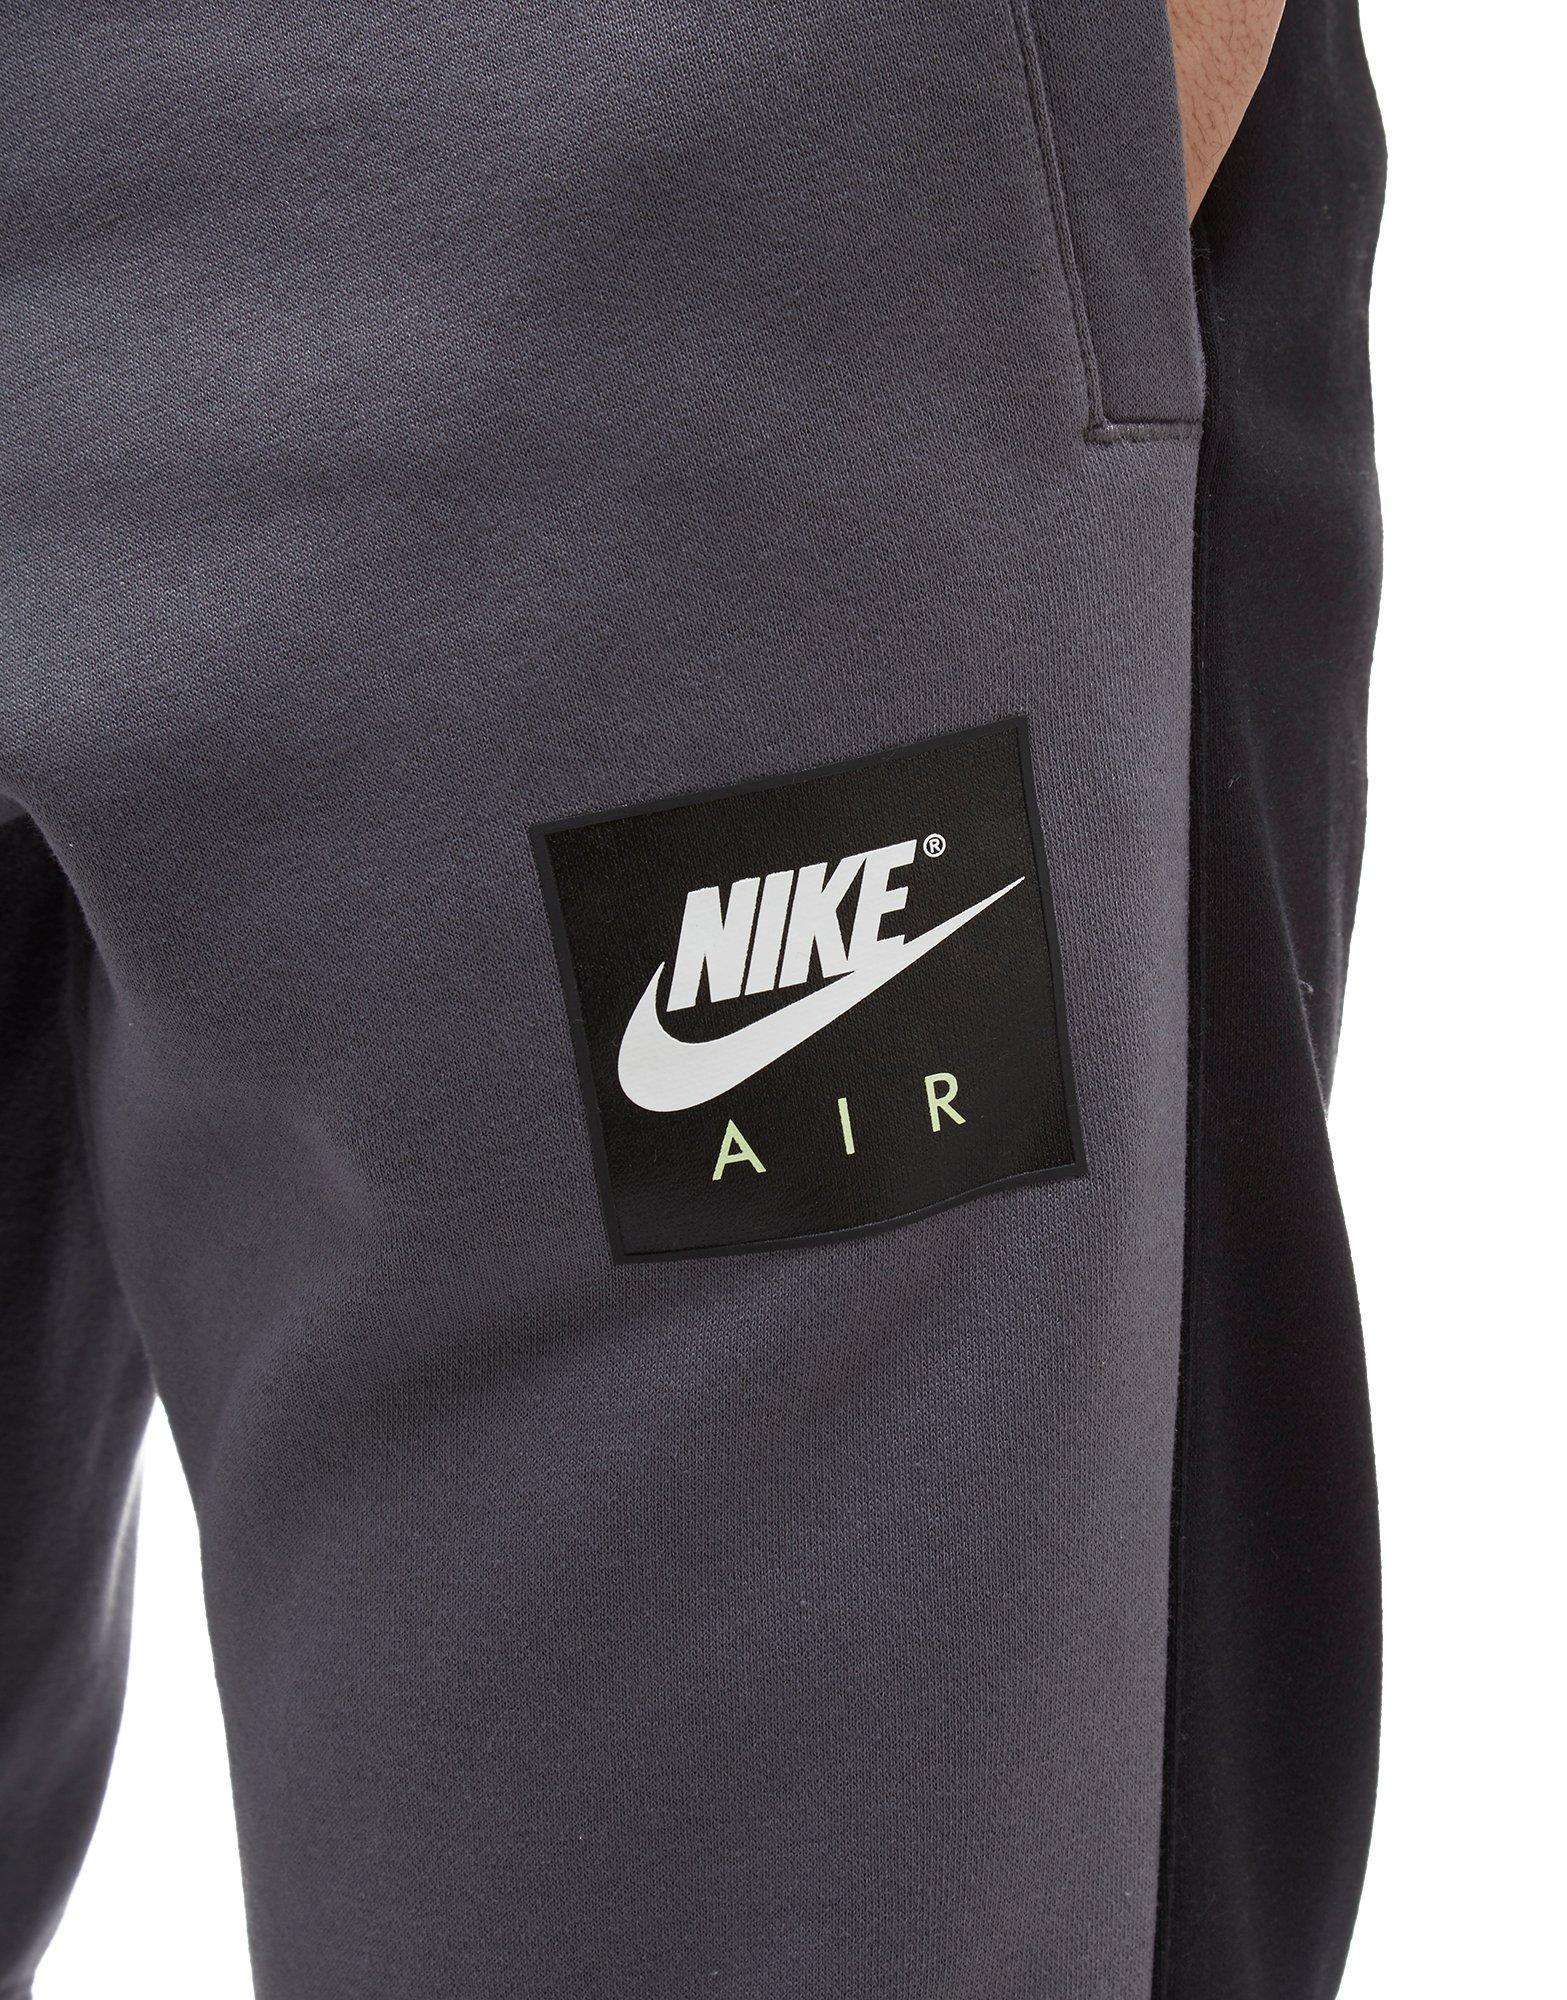 Nike Air Fleece Pants in Grey/Black (Grey) for Men